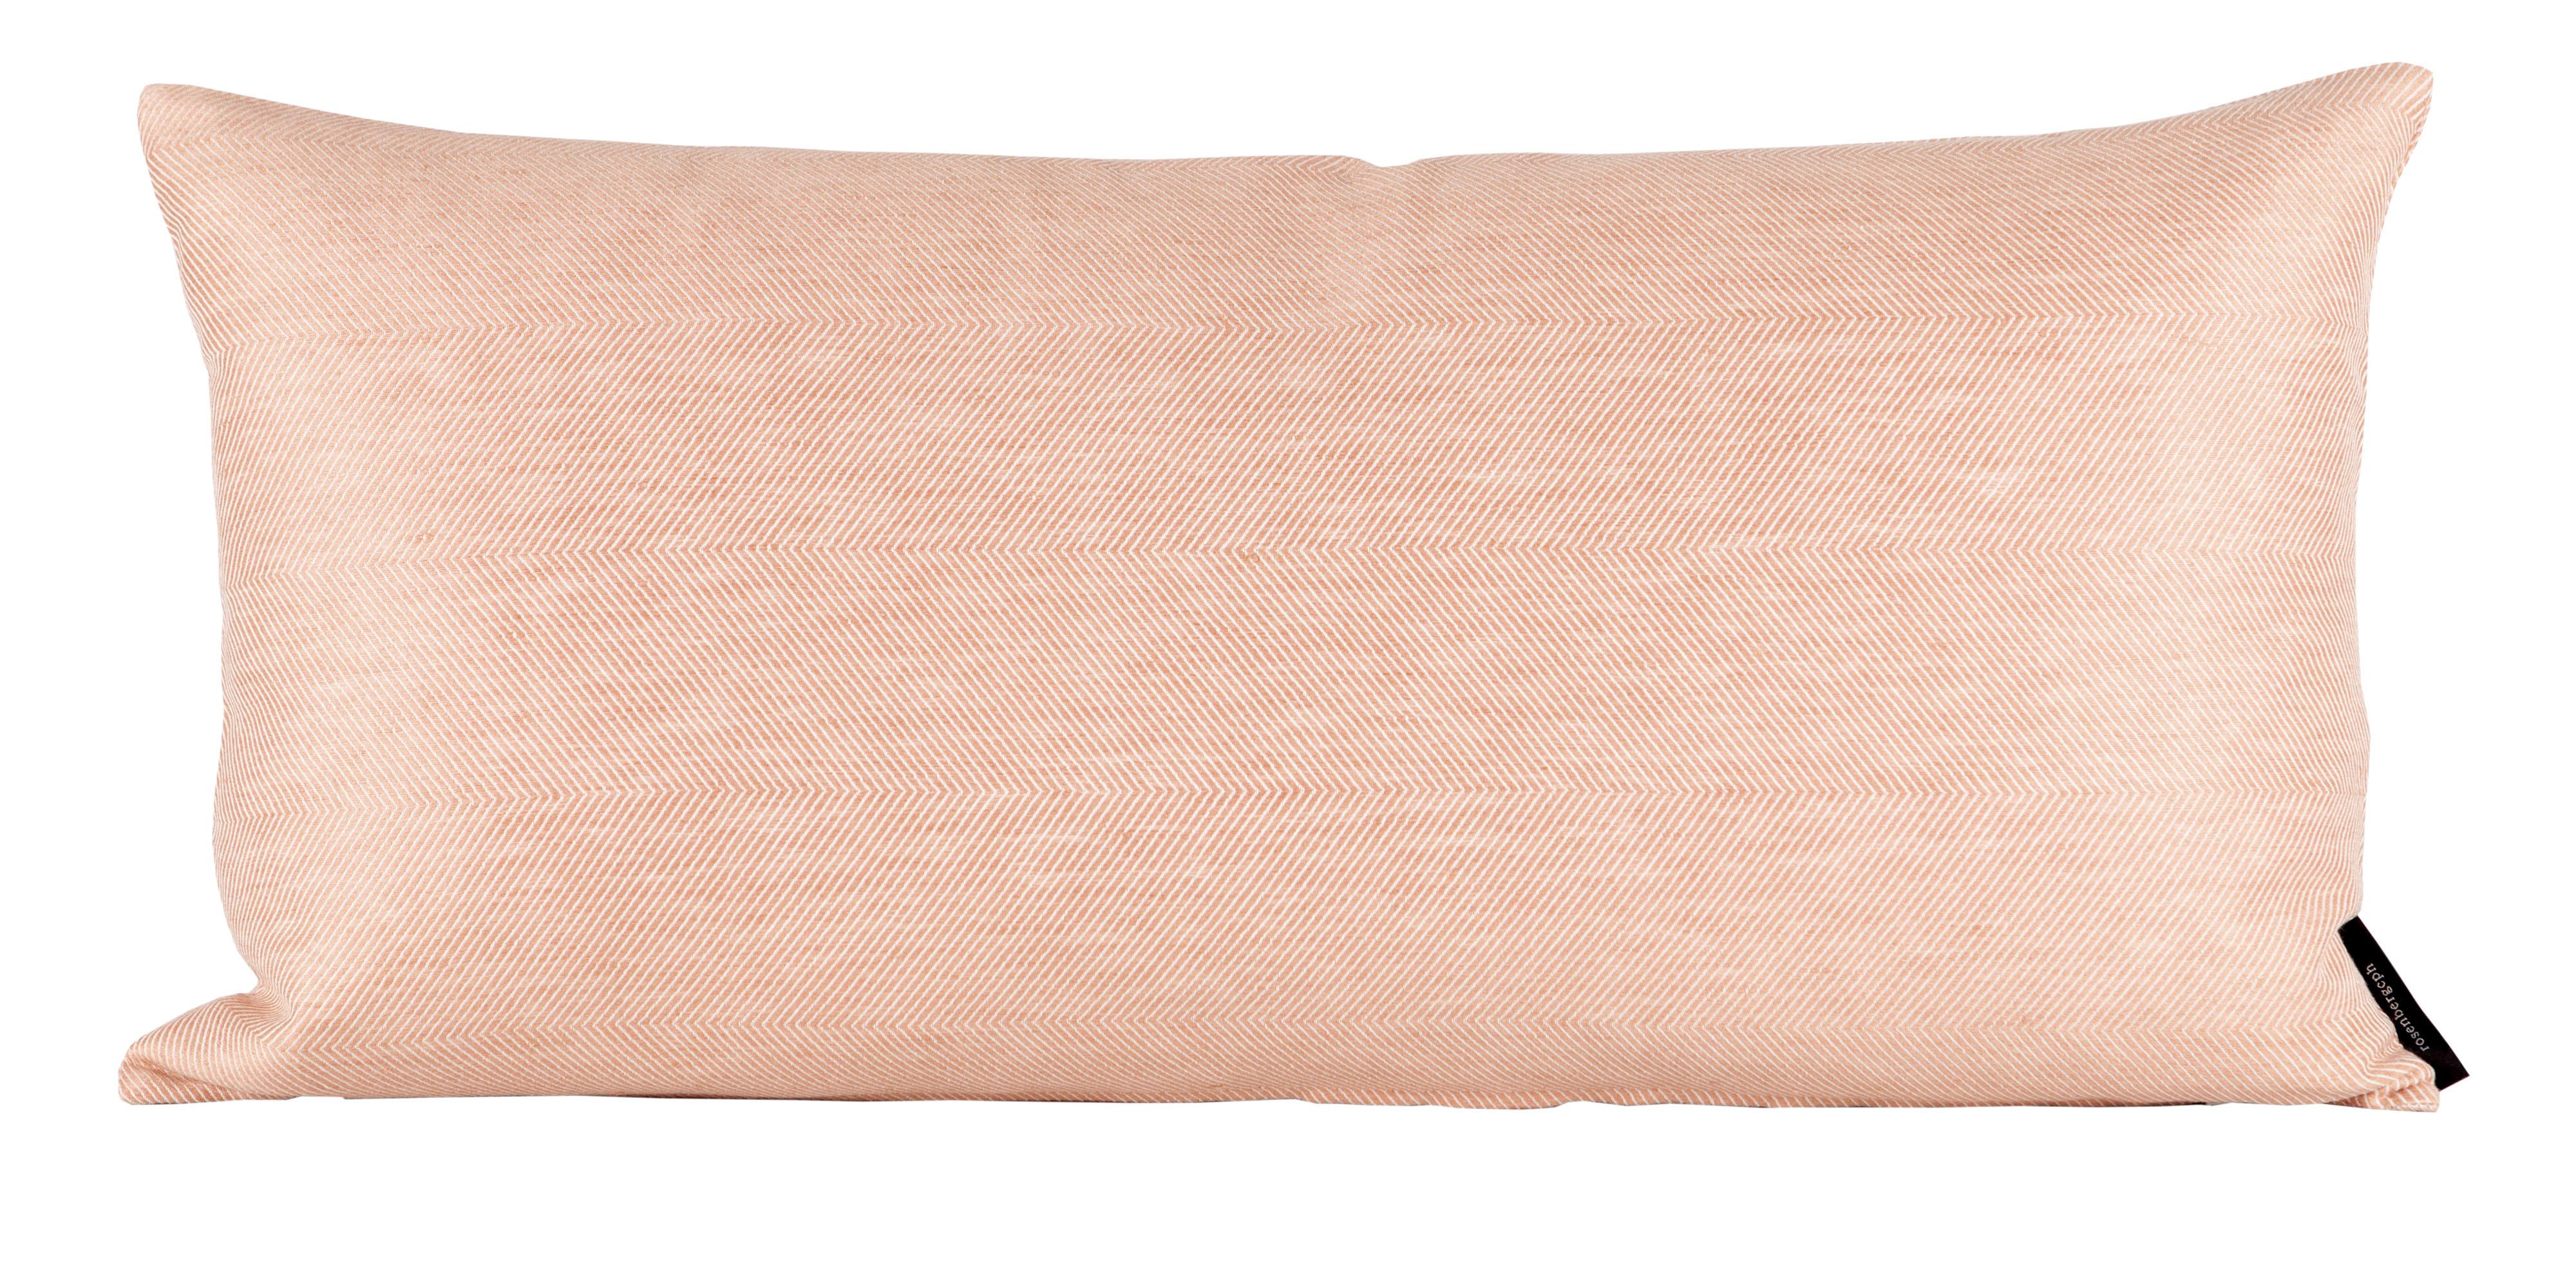 Rectangular, linen/cotton, coral